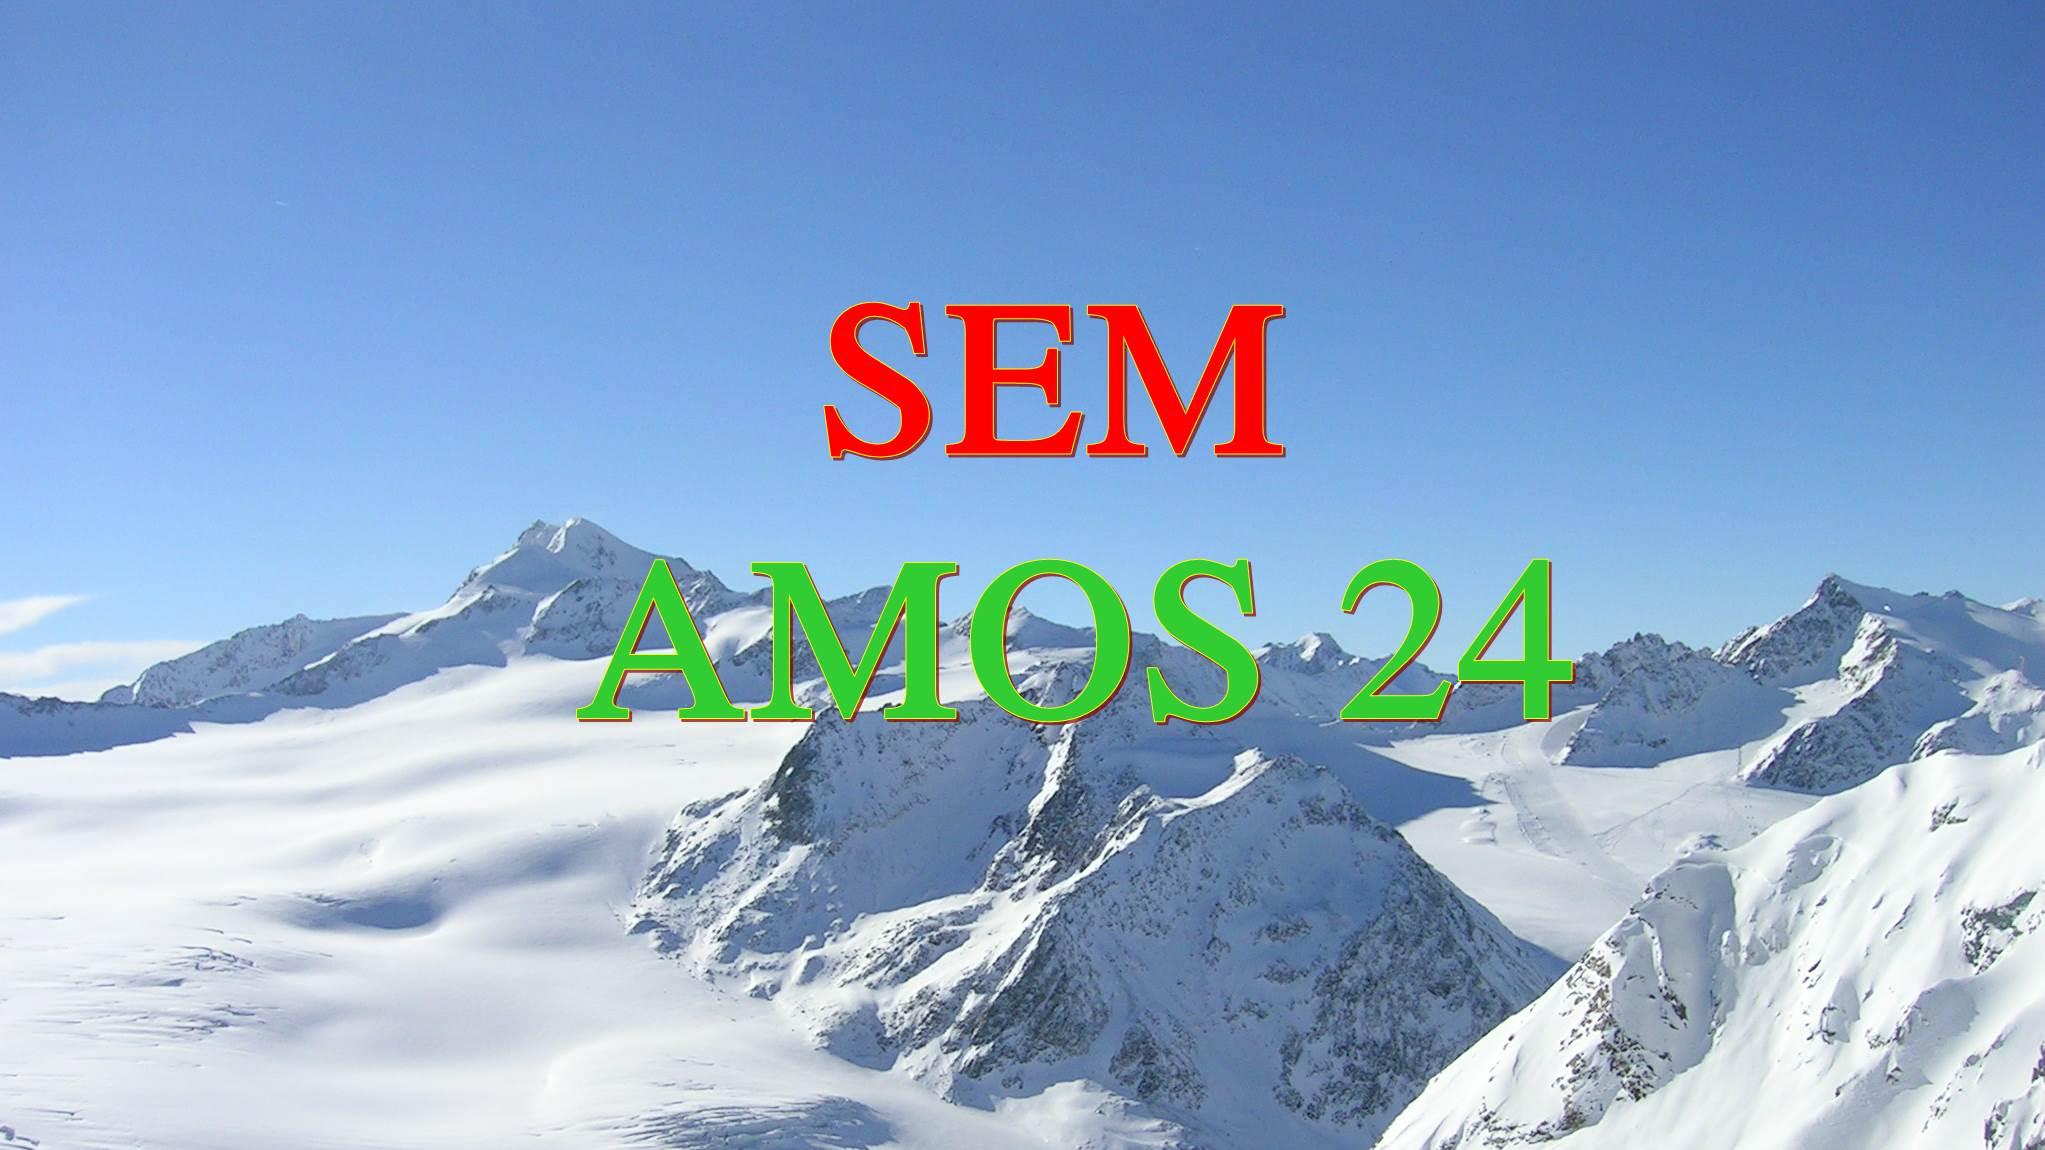 2173161952 4fa52df018 o - Phần mềm phân tích cấu trúc SEM Amos 24